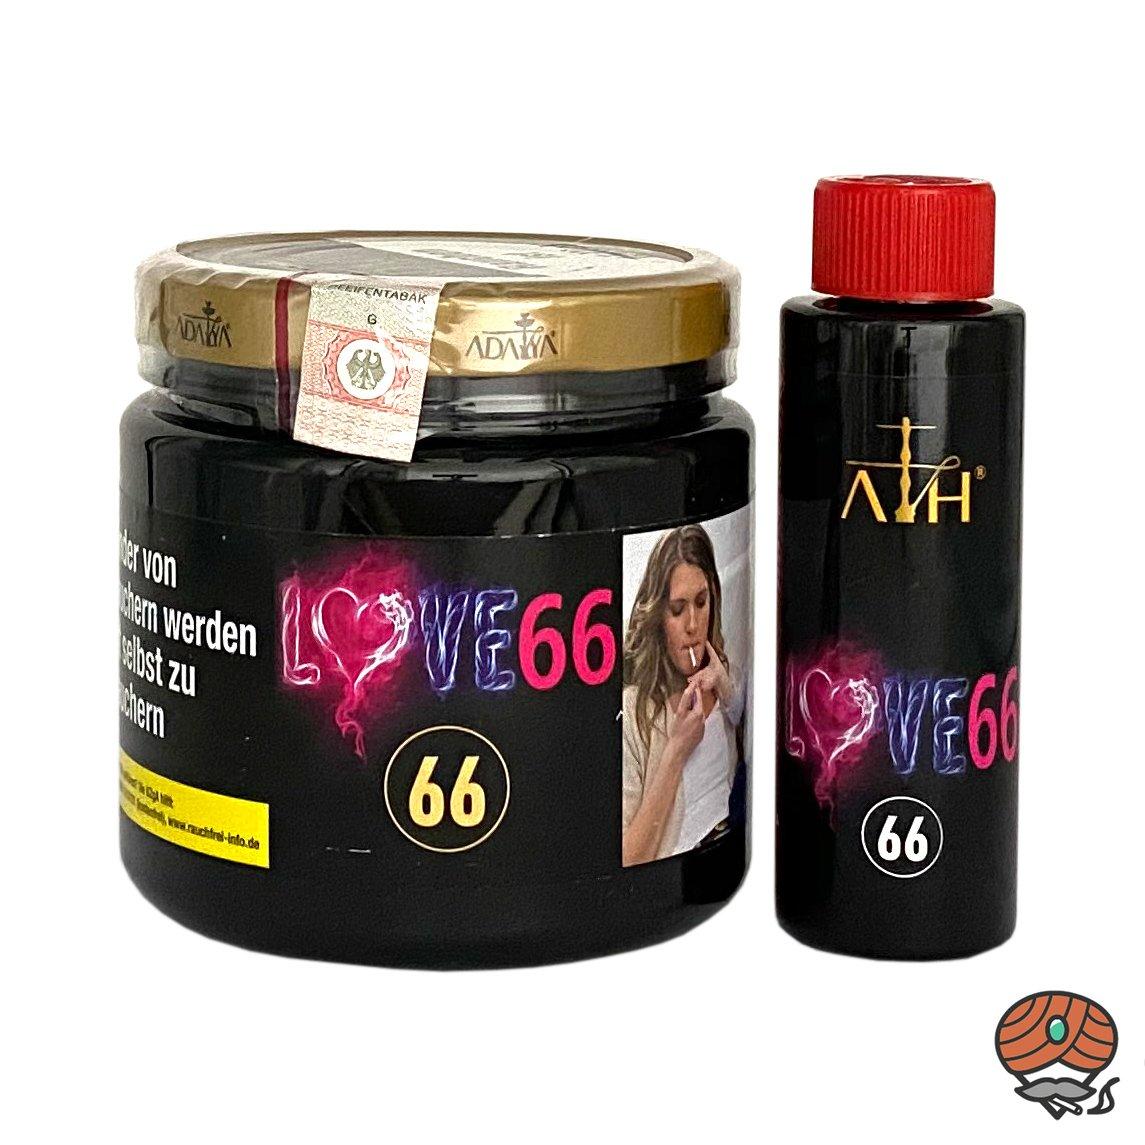 ADALYA LOVE 66 #66 - 1000g Shisha Tabak + ATH Love 66